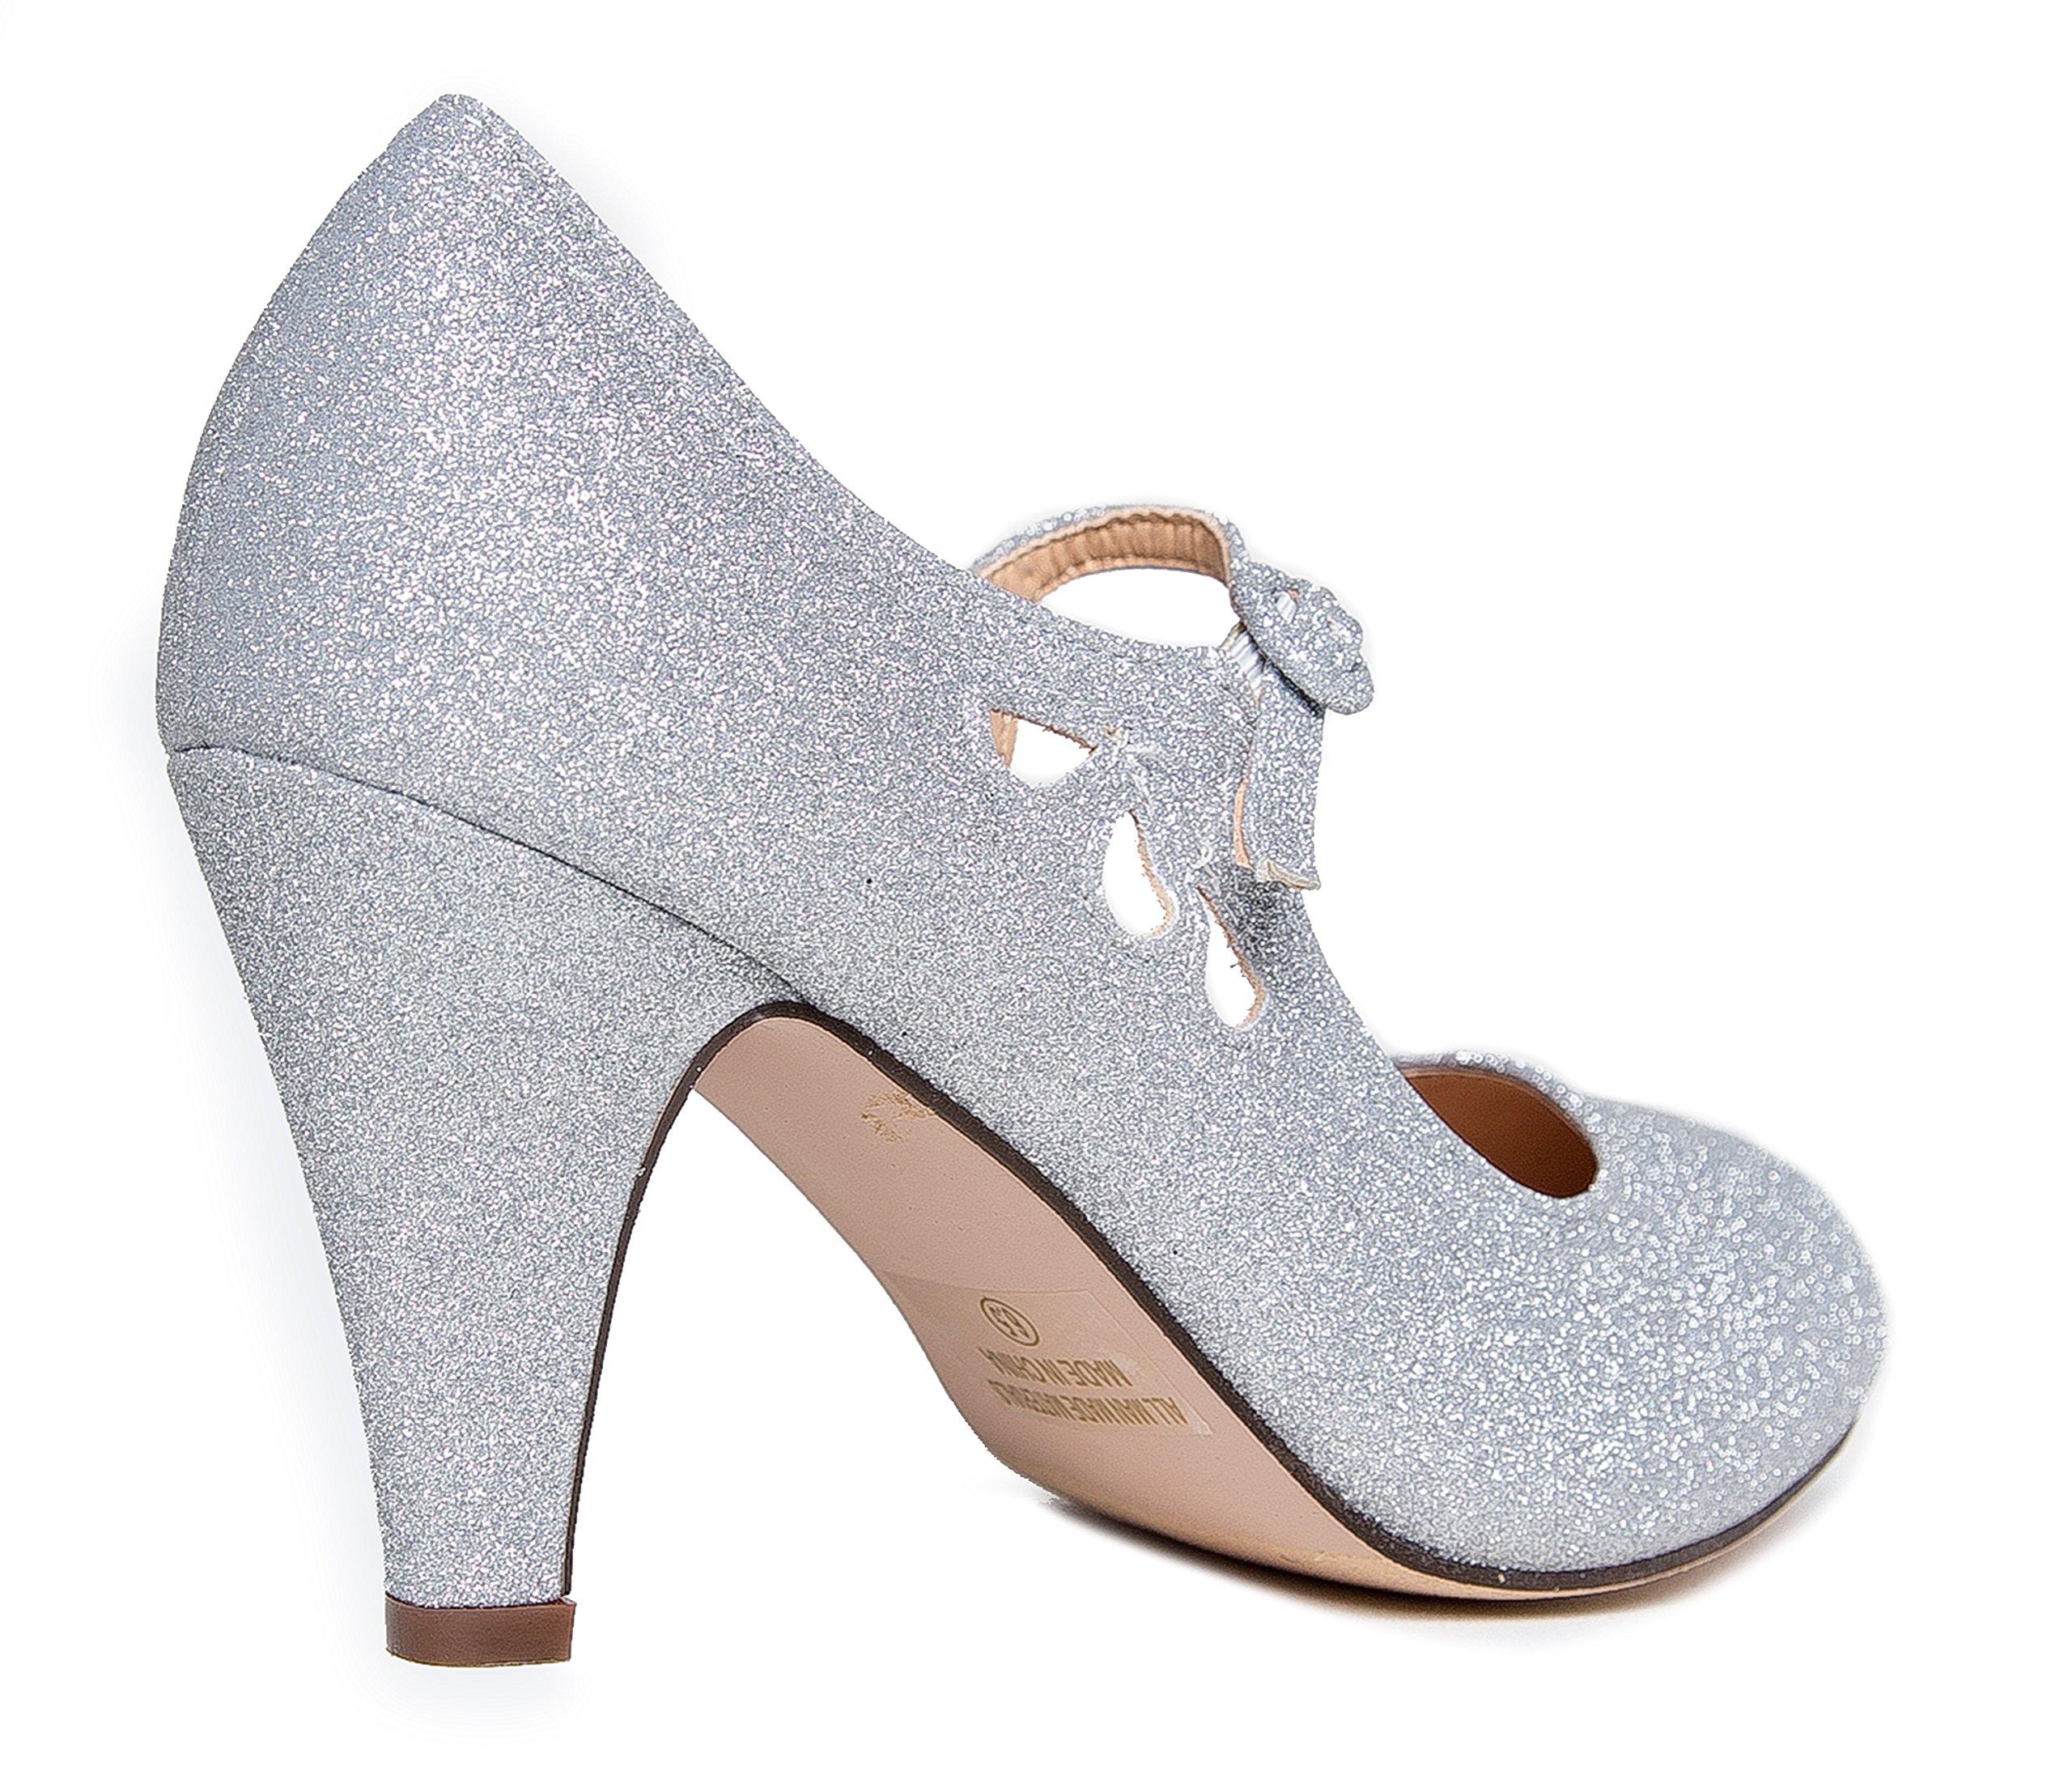 Pixie Mary Jane Heel, Silver Glitter, 8 B(M) US by ZooShoo (Image #3)